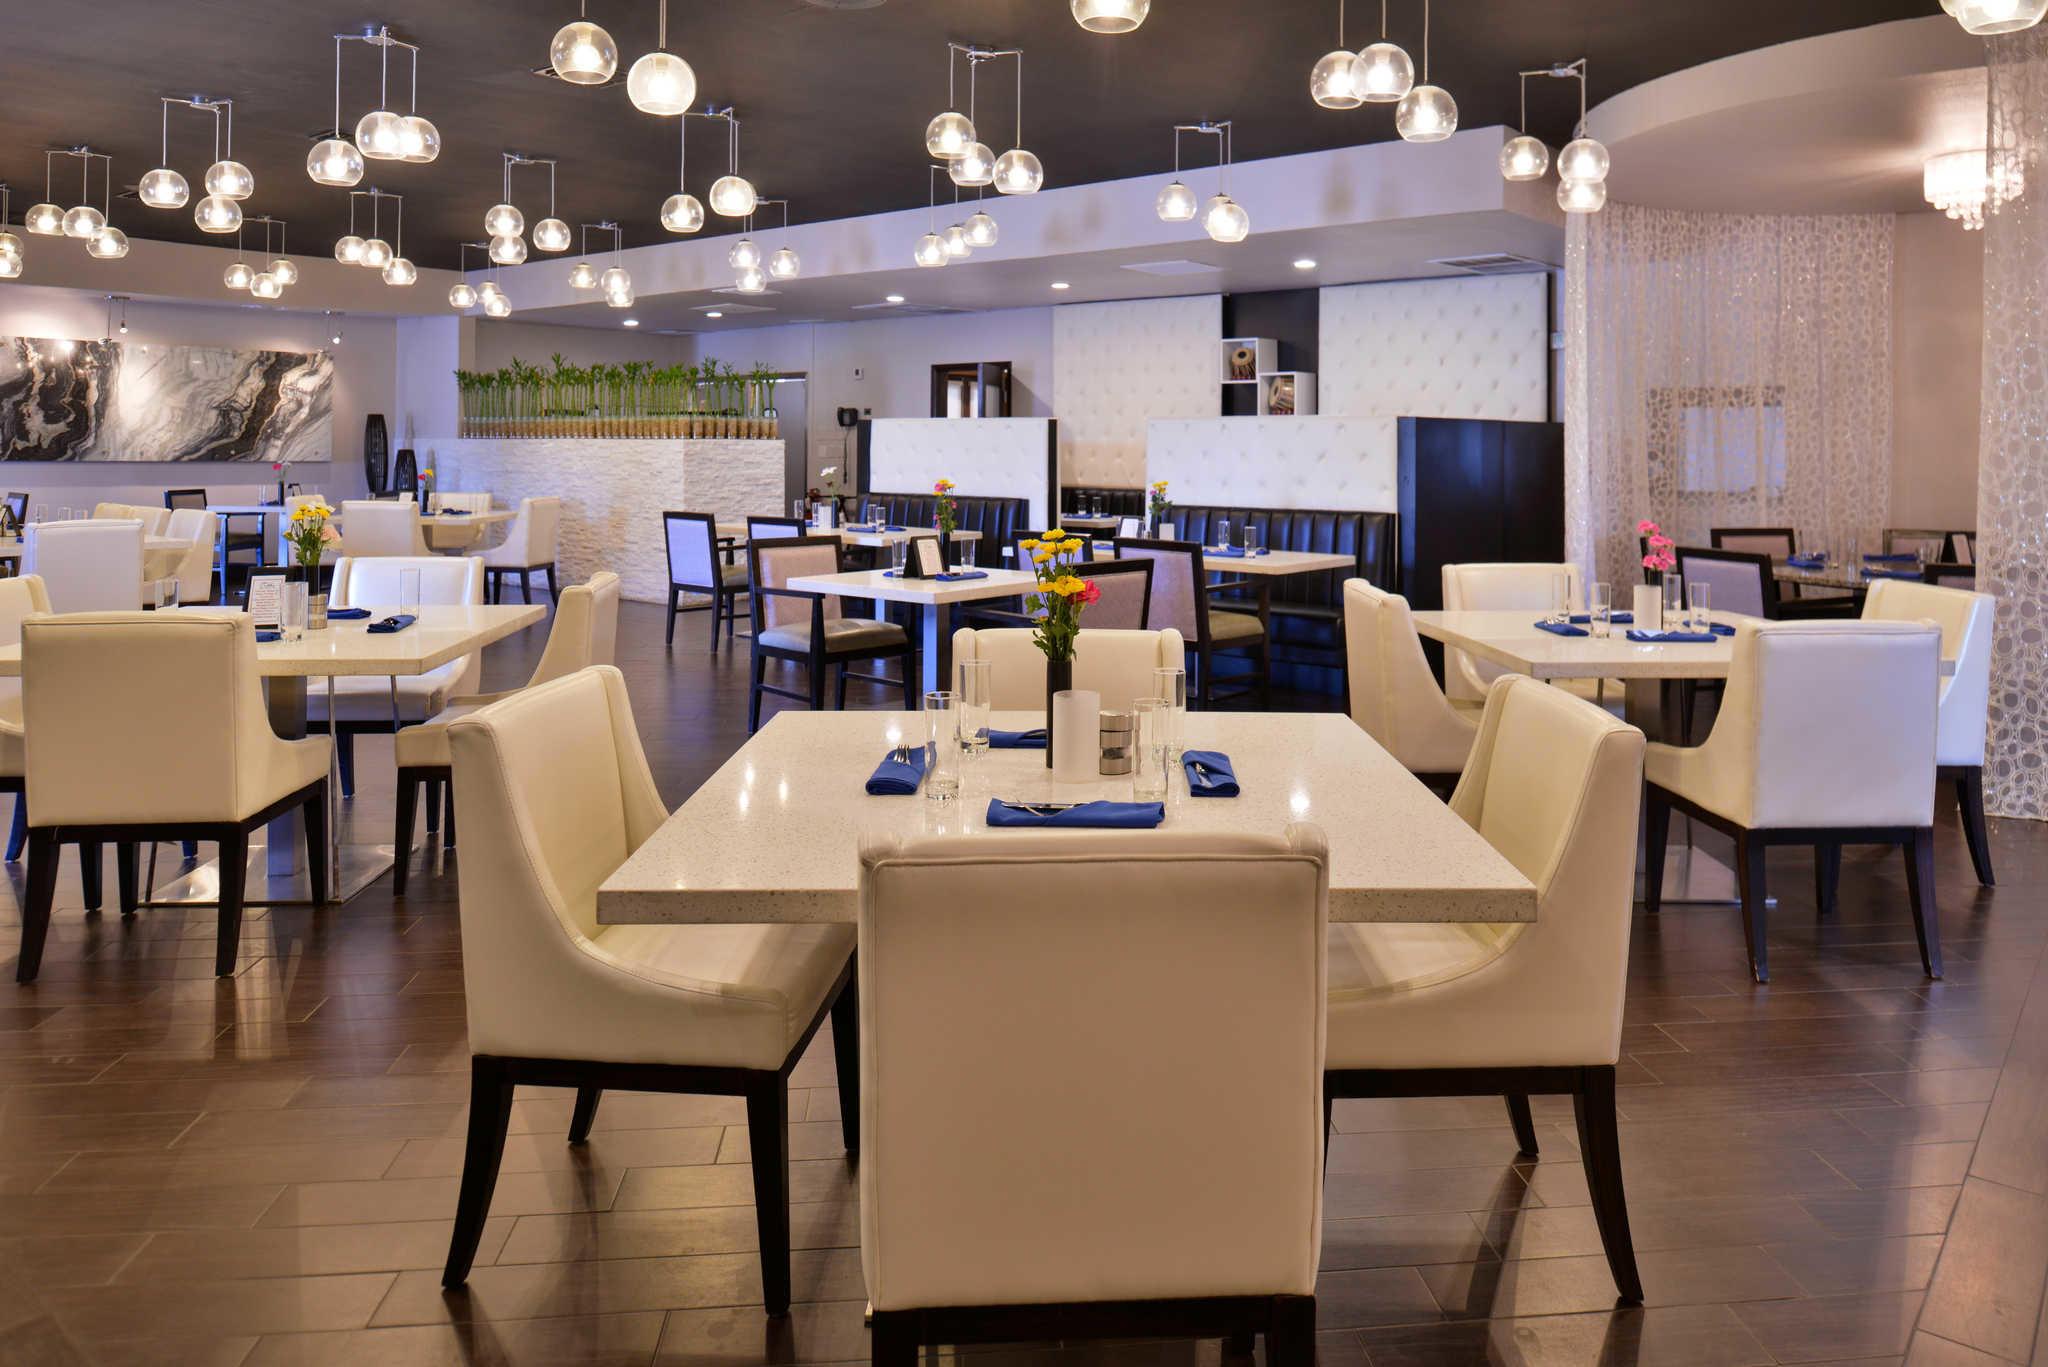 Clarion Inn & Suites Orlando near Theme Parks image 32